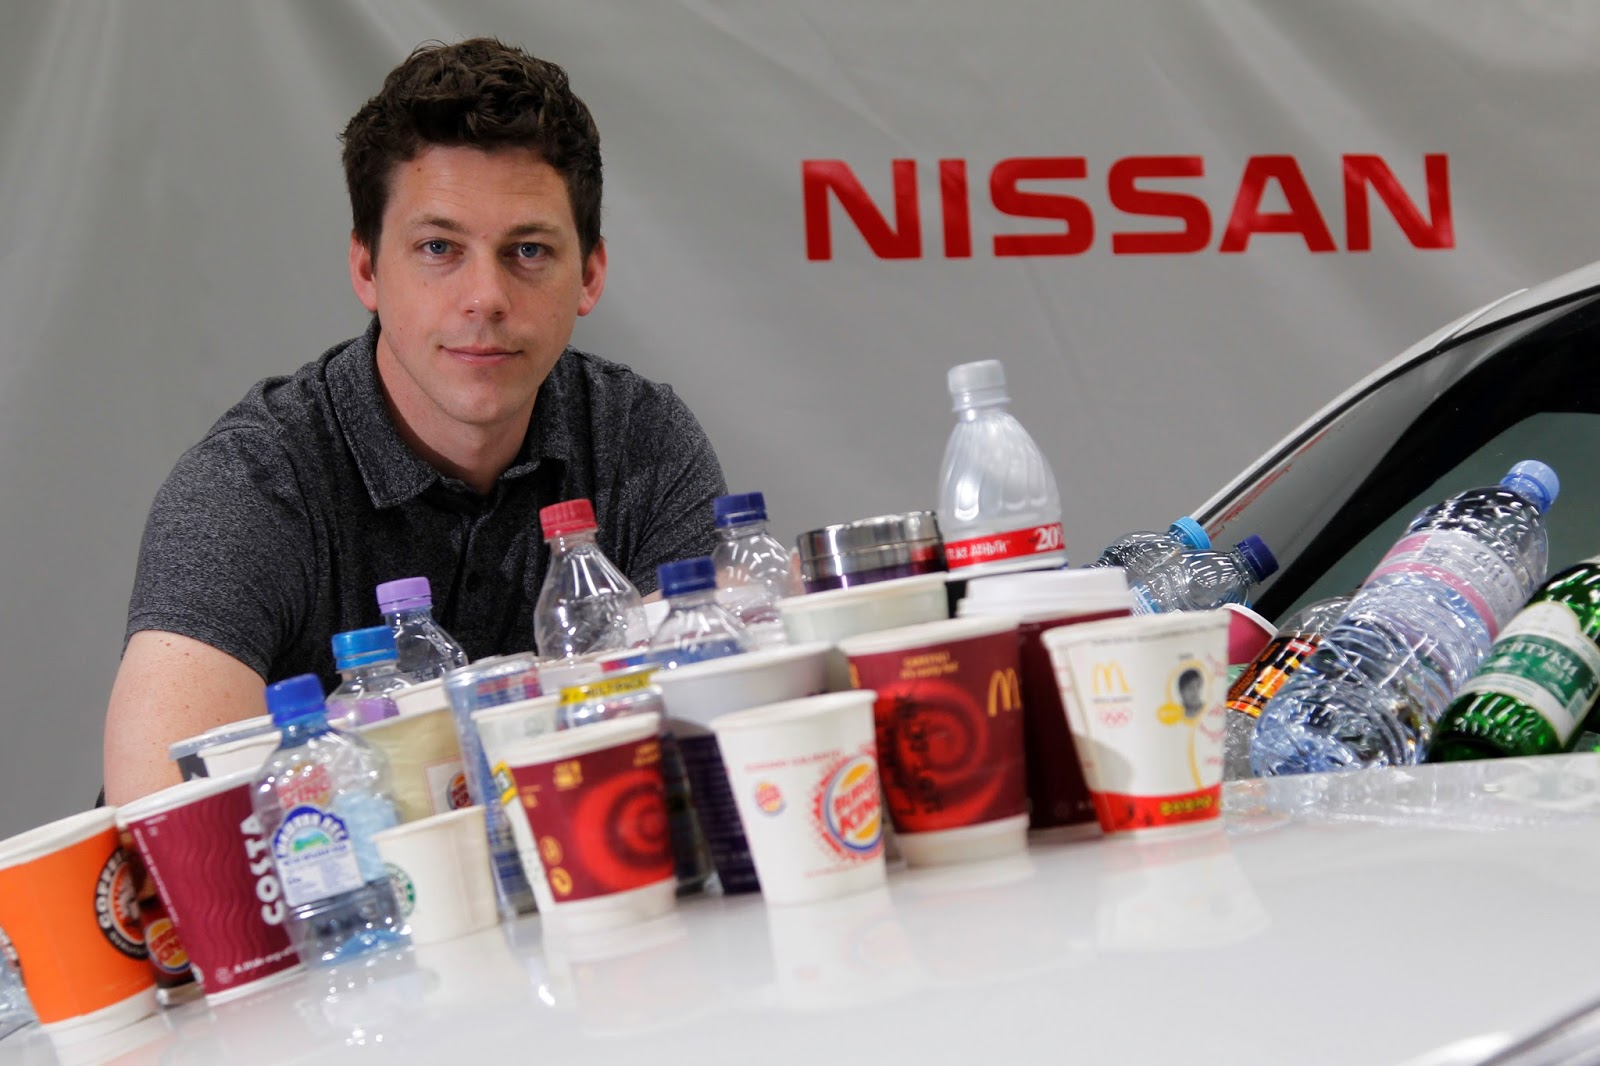 147255 1 5 Tι ξεχωριστό έχουν οι ποτηροθήκες στα μοντέλα της Nissan; Nissan